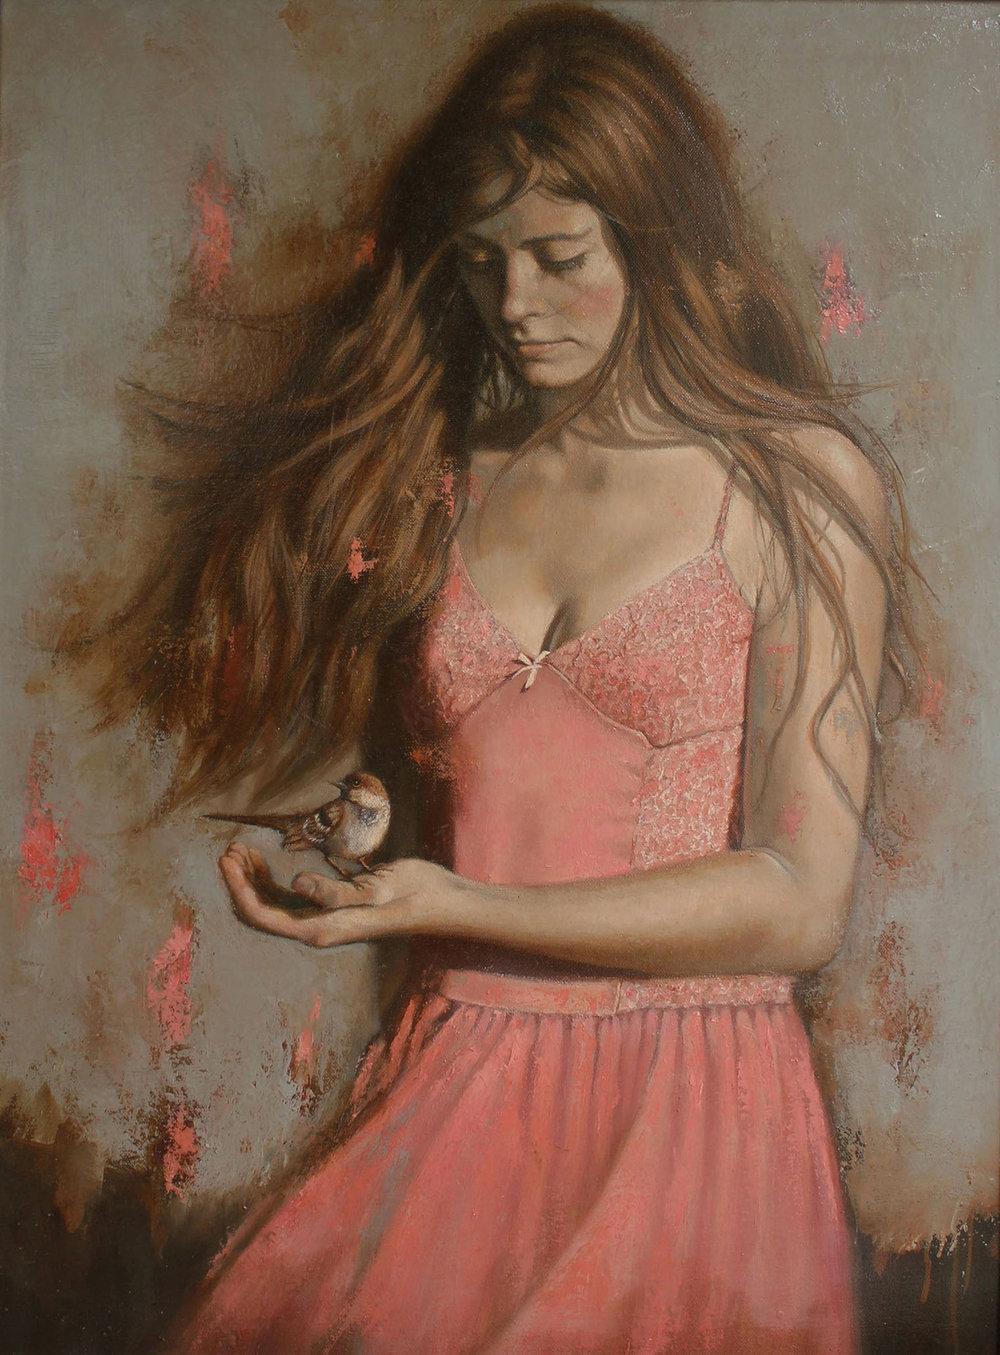 Girl with Bird 2 - 80x70cm